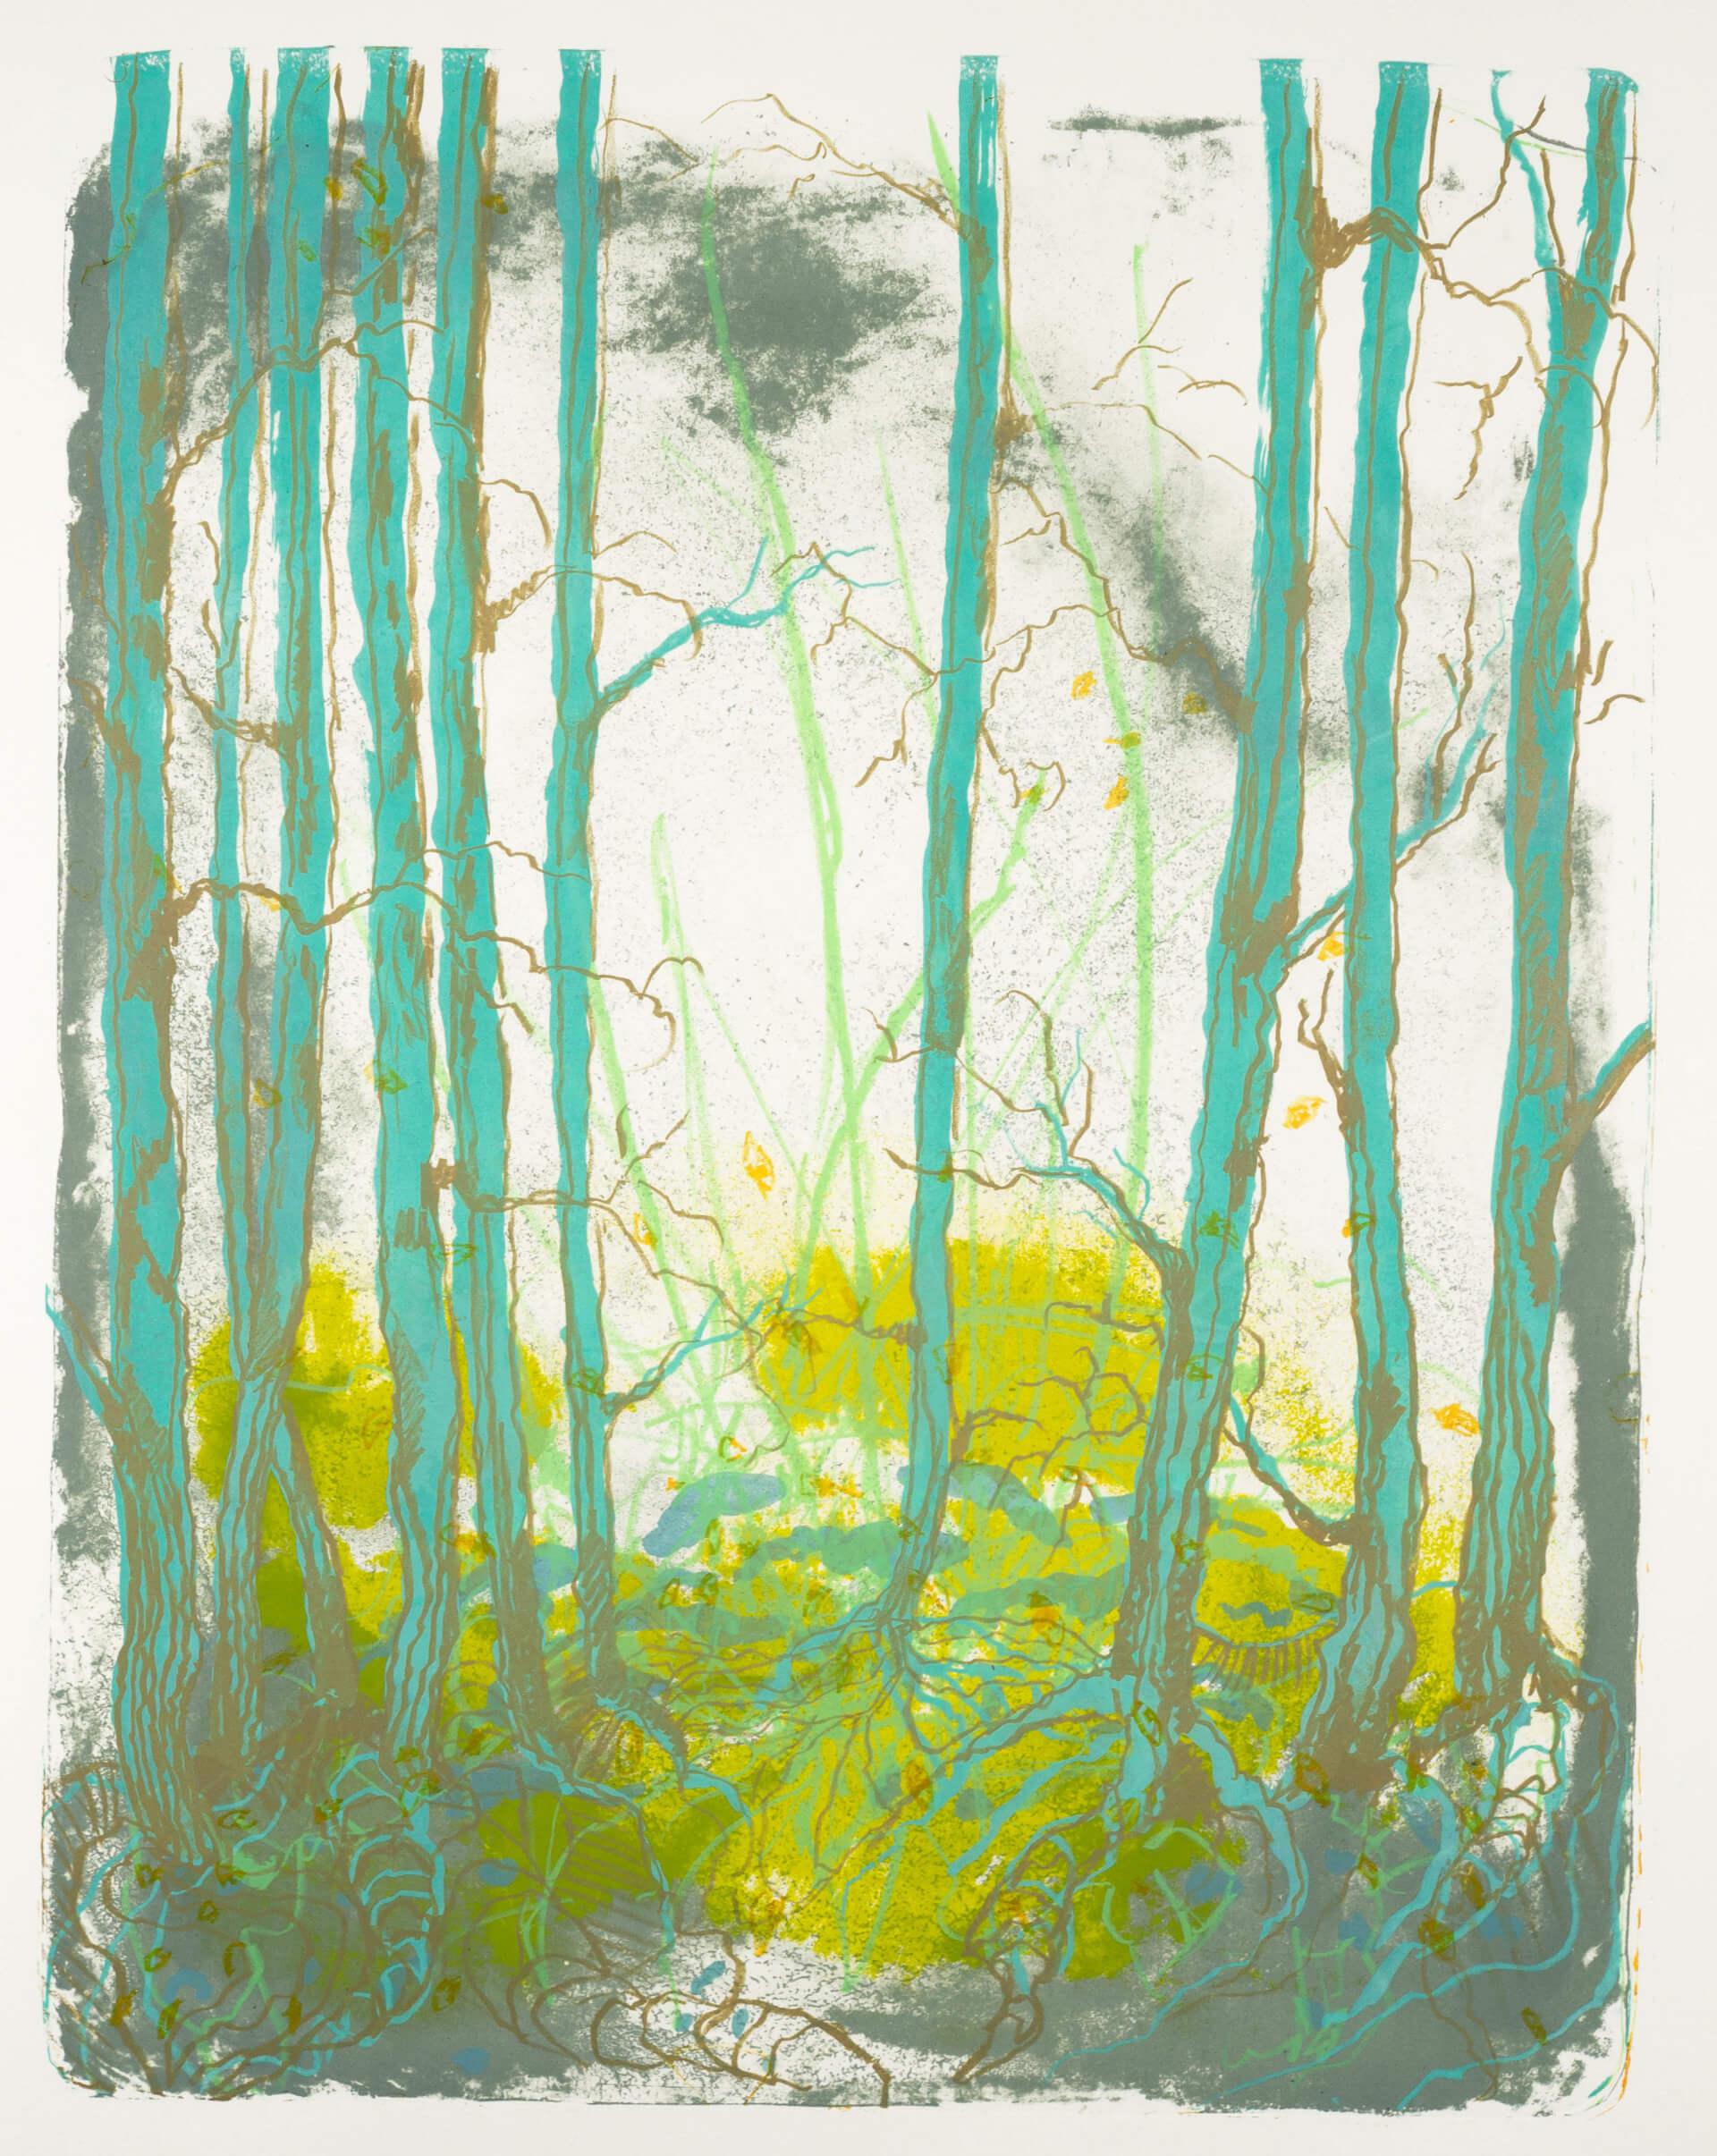 Wald X(D)-X, 2019, Farblithographie, Unikat, 50x40 cm